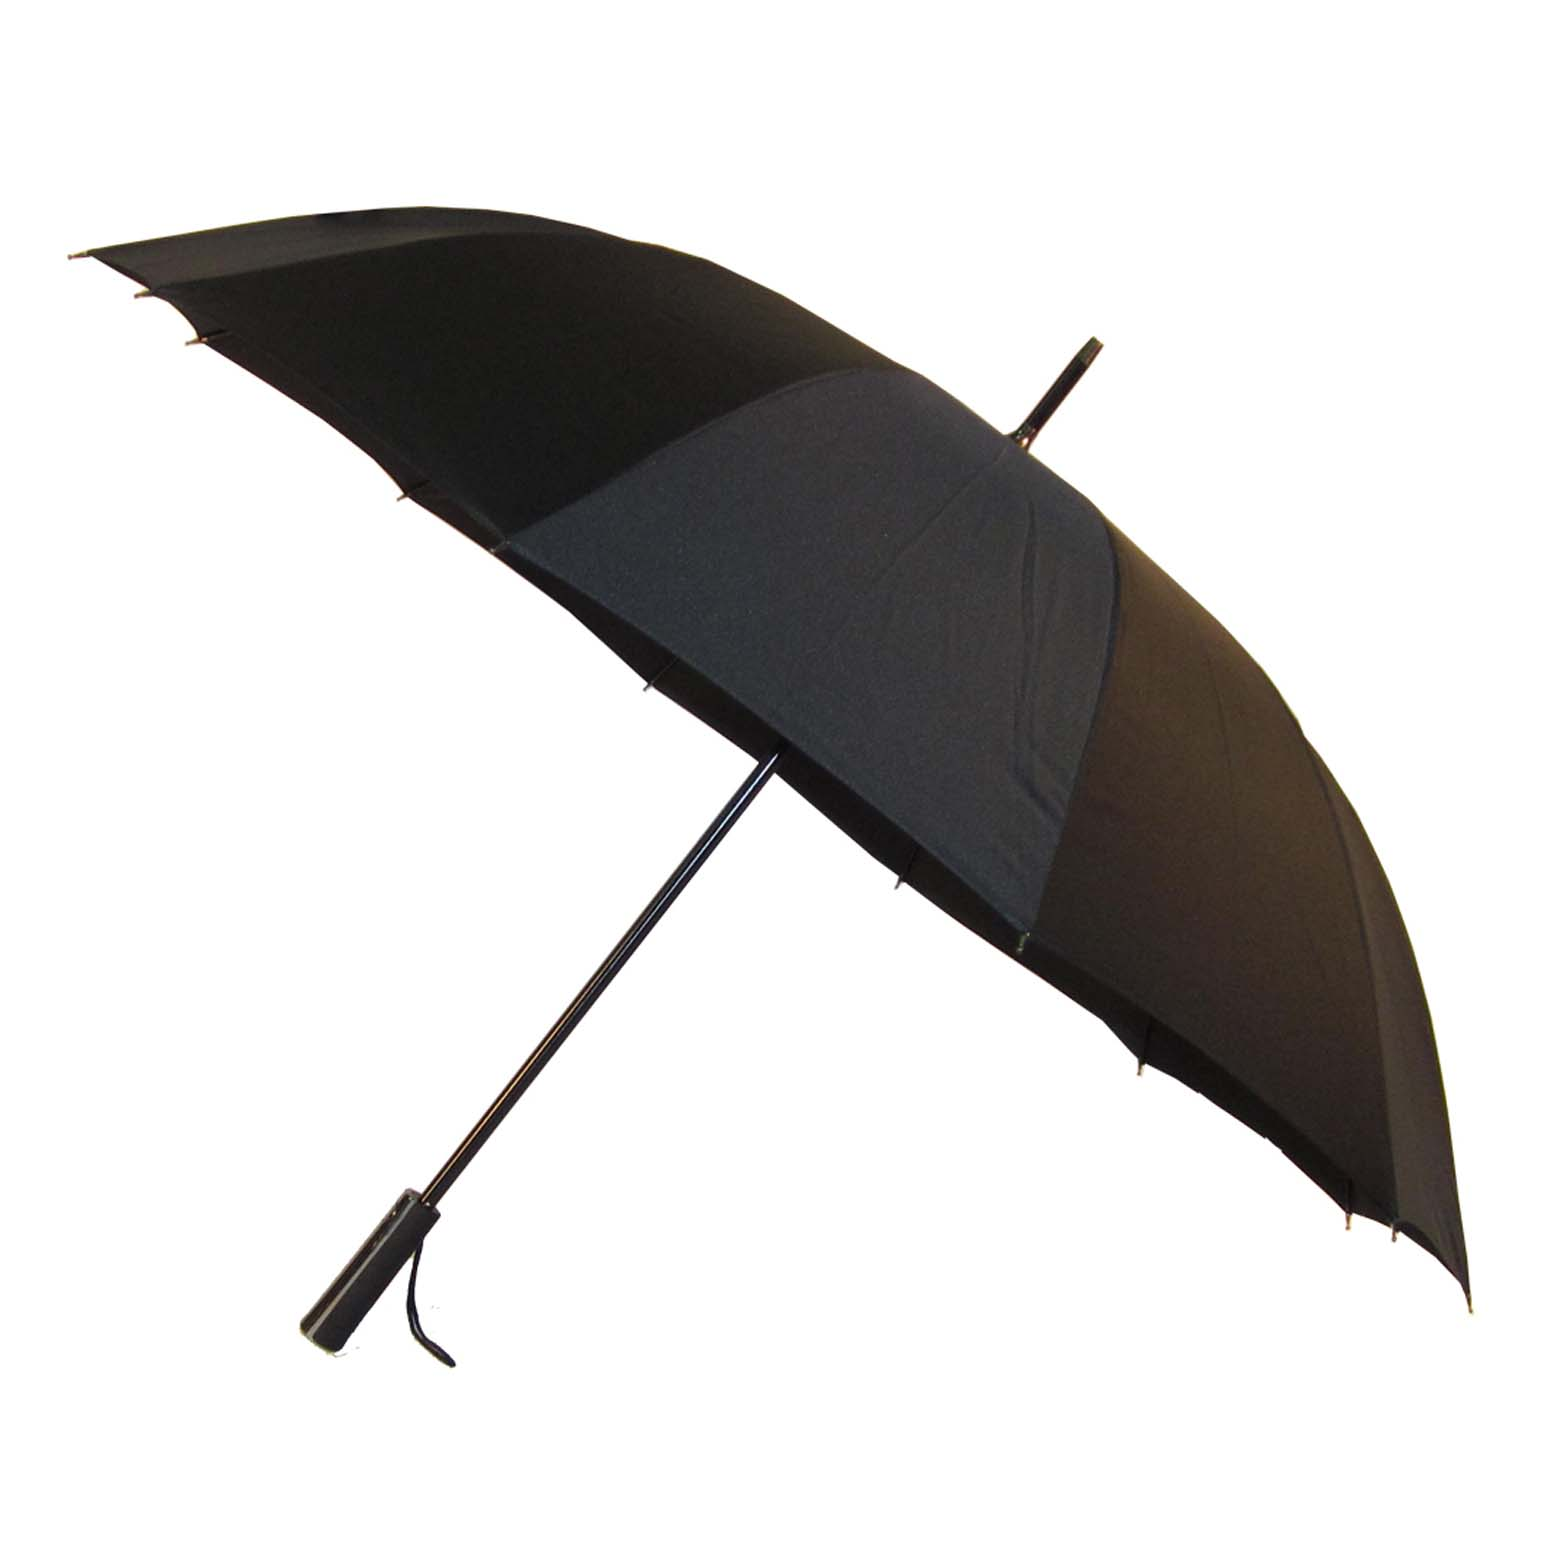 52cm Folding Umbrella-Manual #42001009083